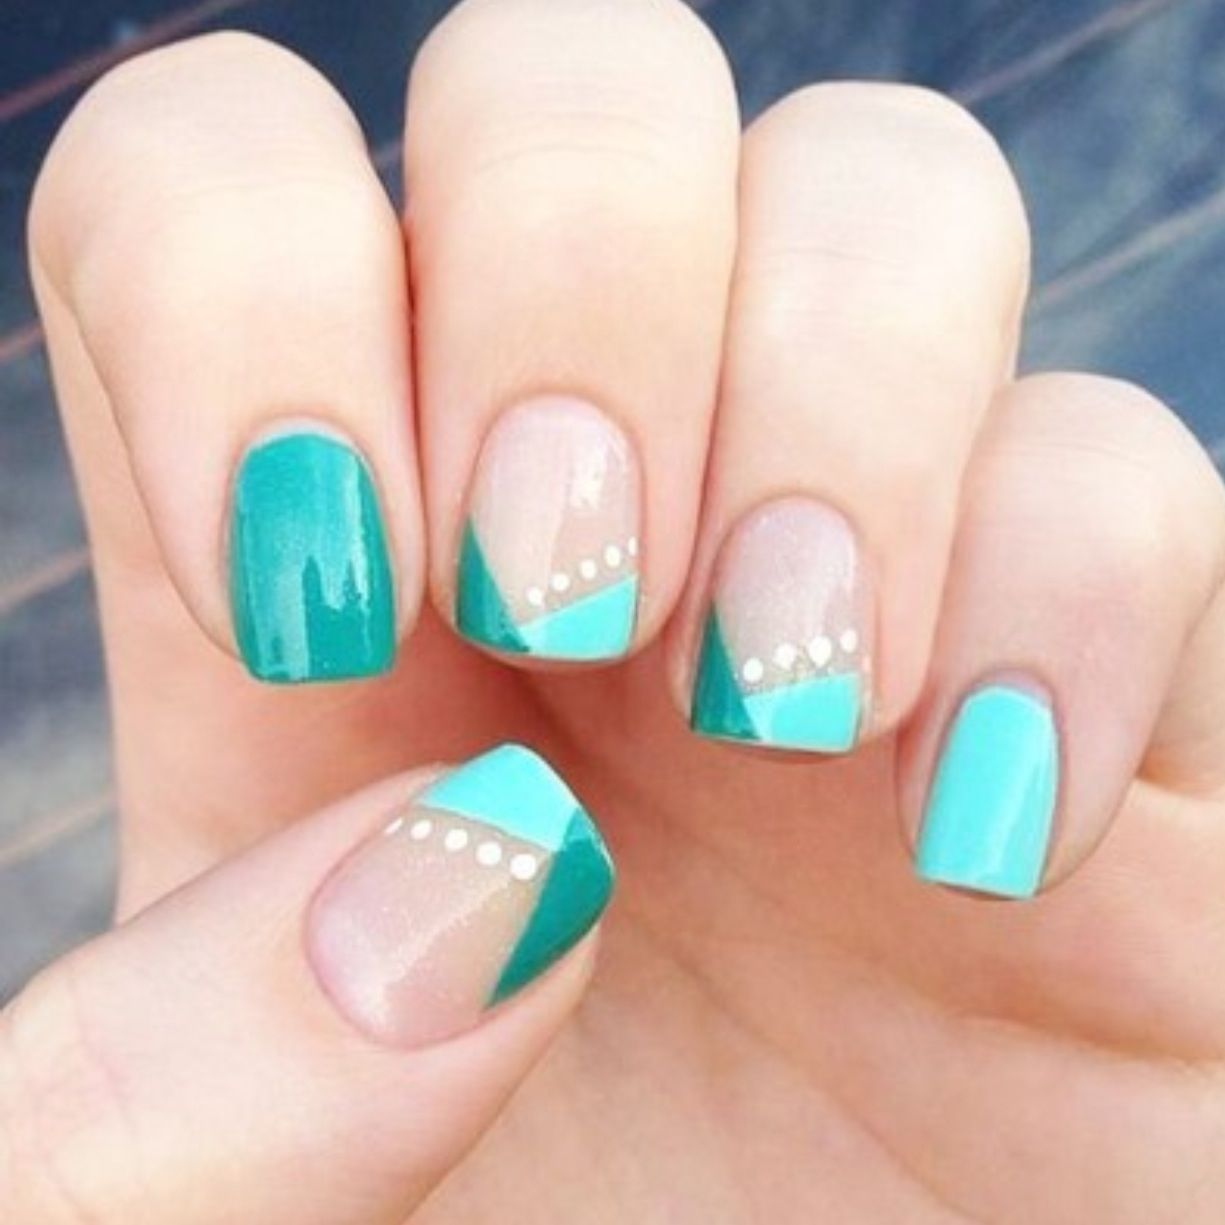 Qt nails(: | nails styles | Pinterest | Nagelschere, Nagellack kunst ...